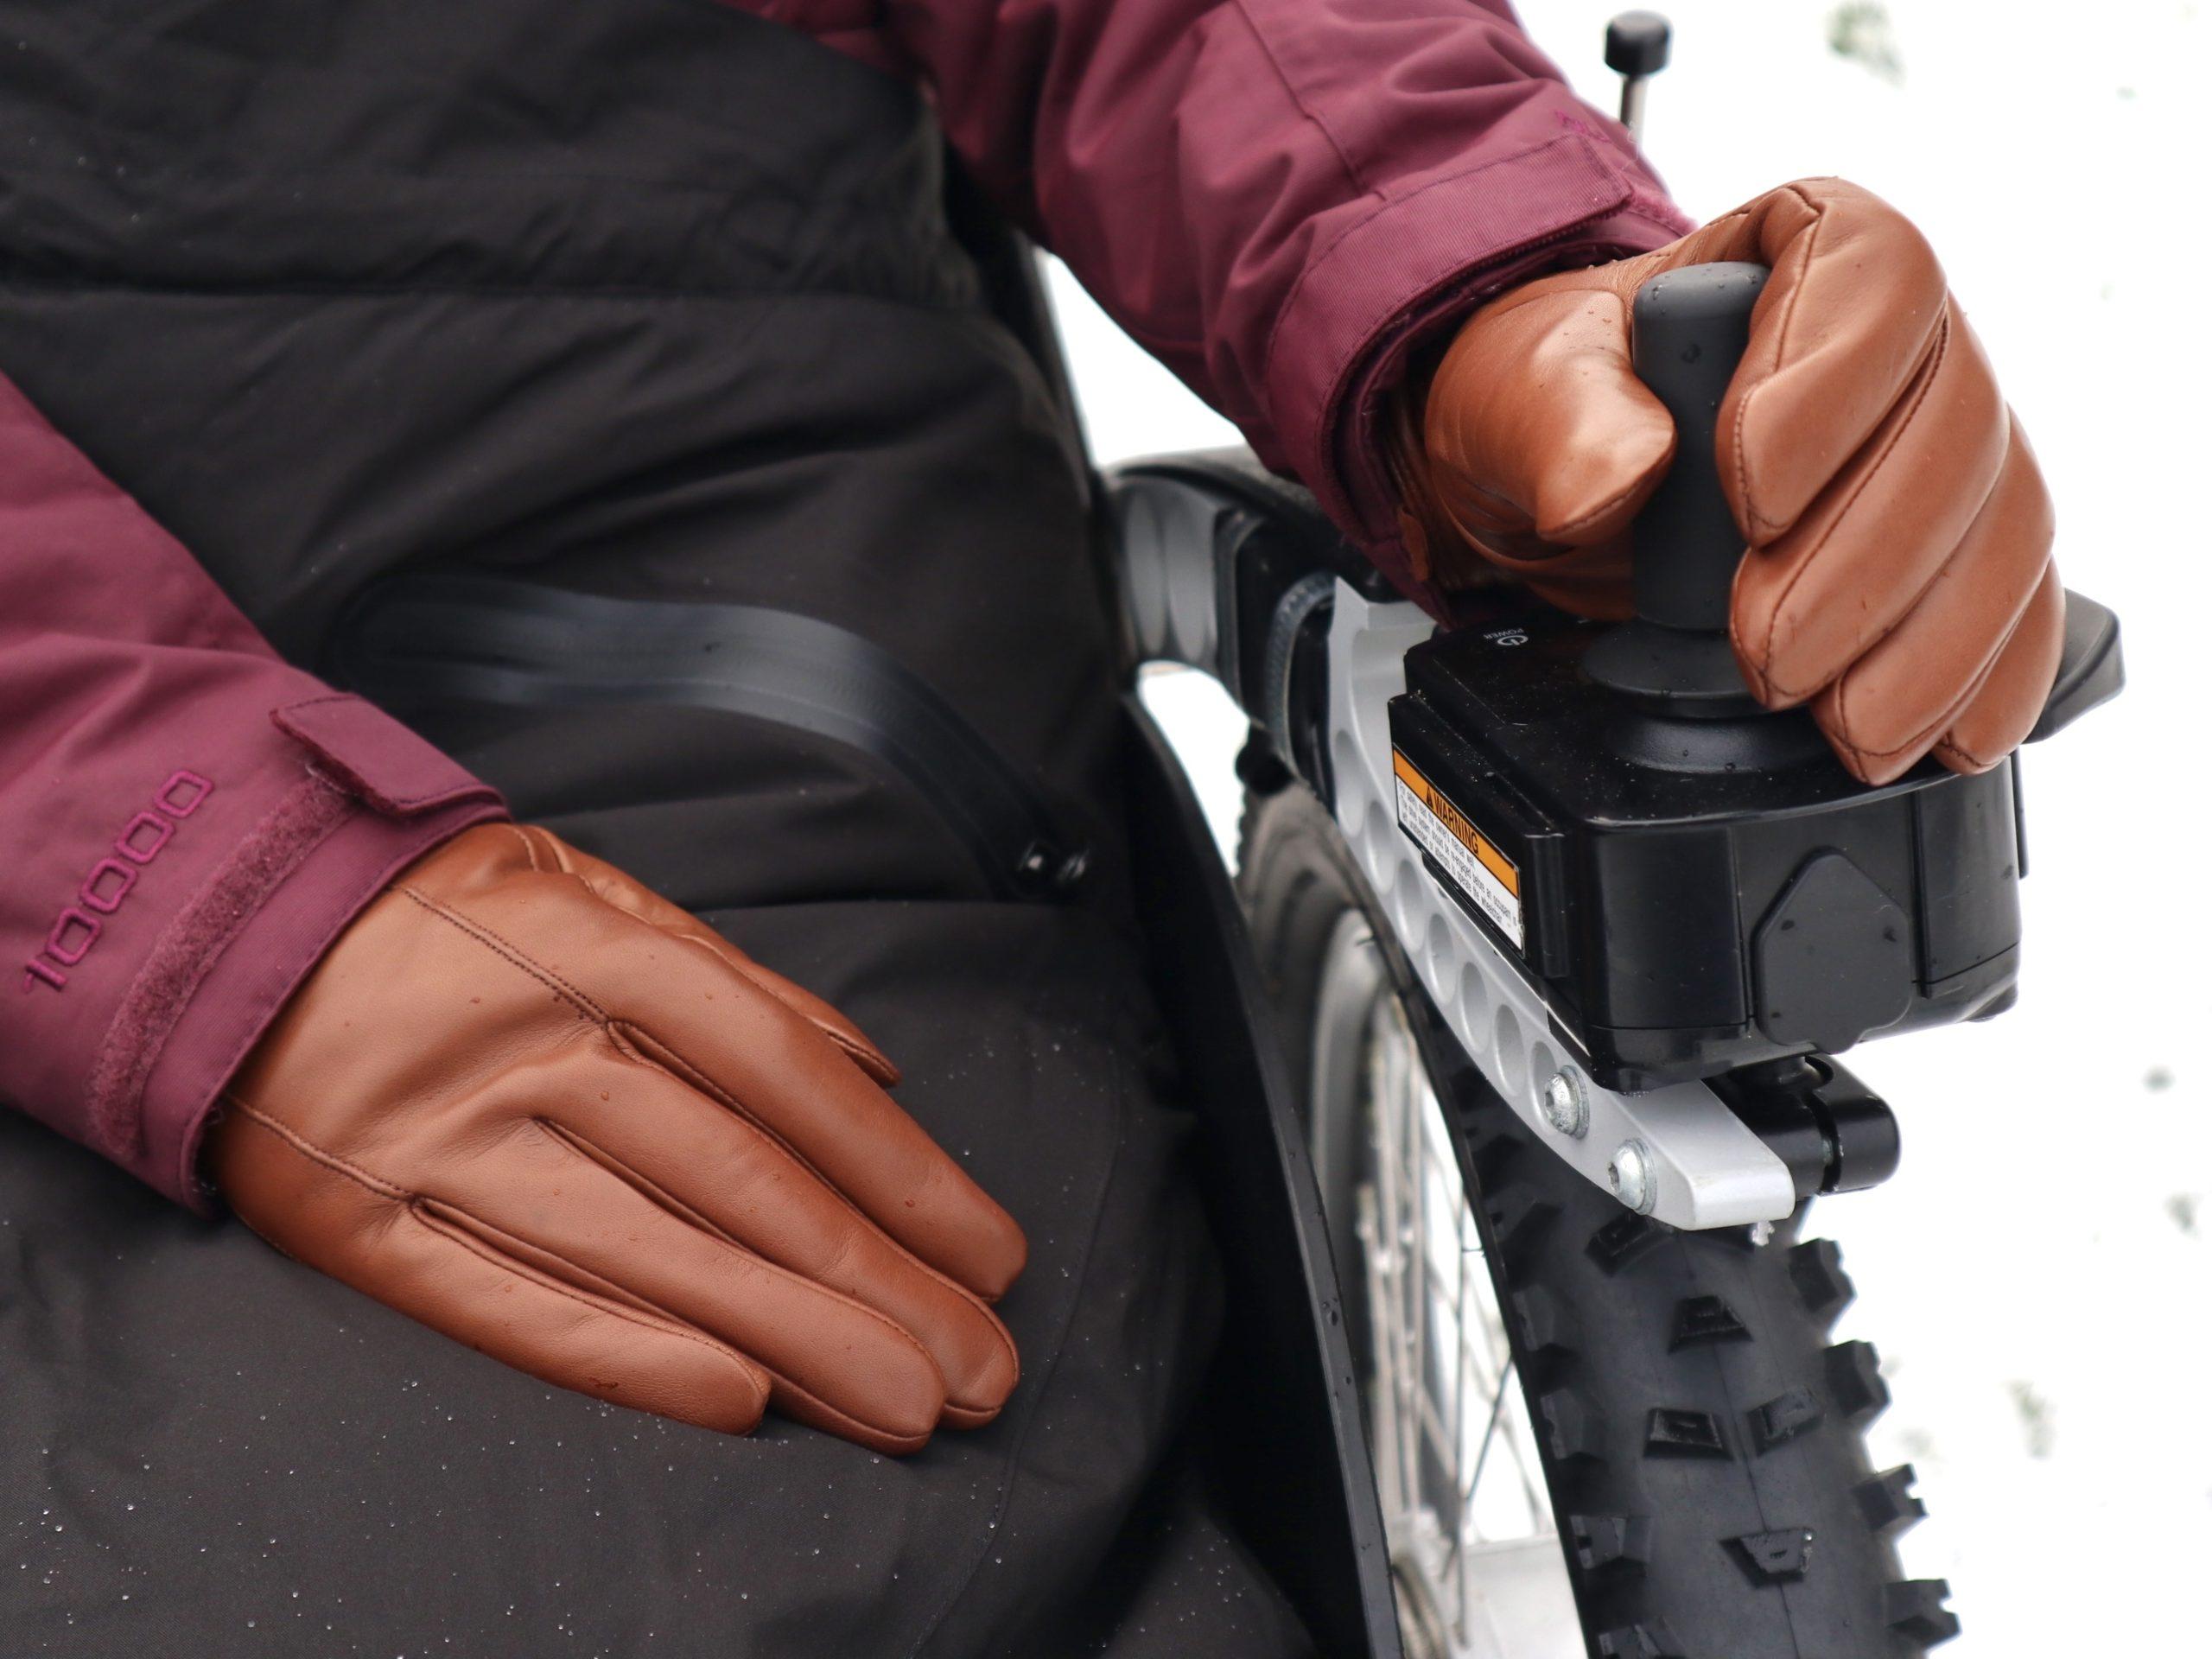 Hands of Warriors – Wheelchair Gloves